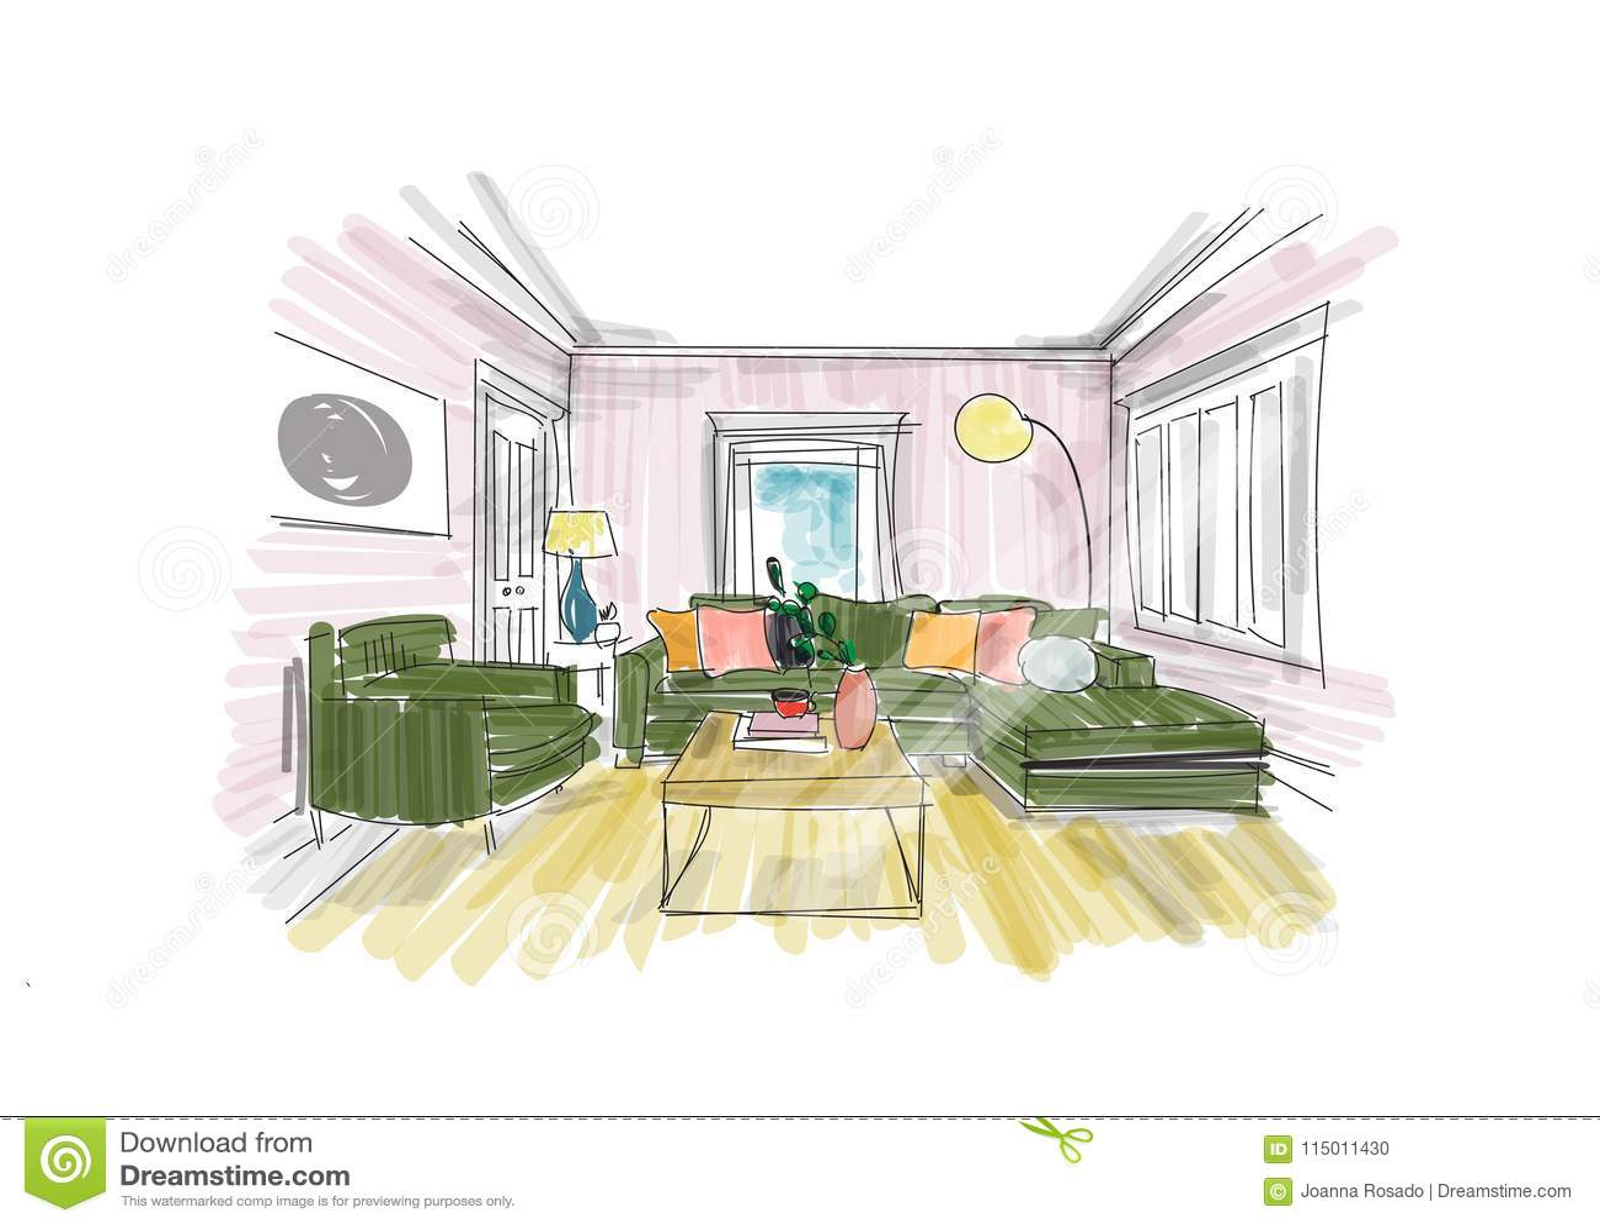 Interior Design Sketch Hand Drawn Vector Illustration Of